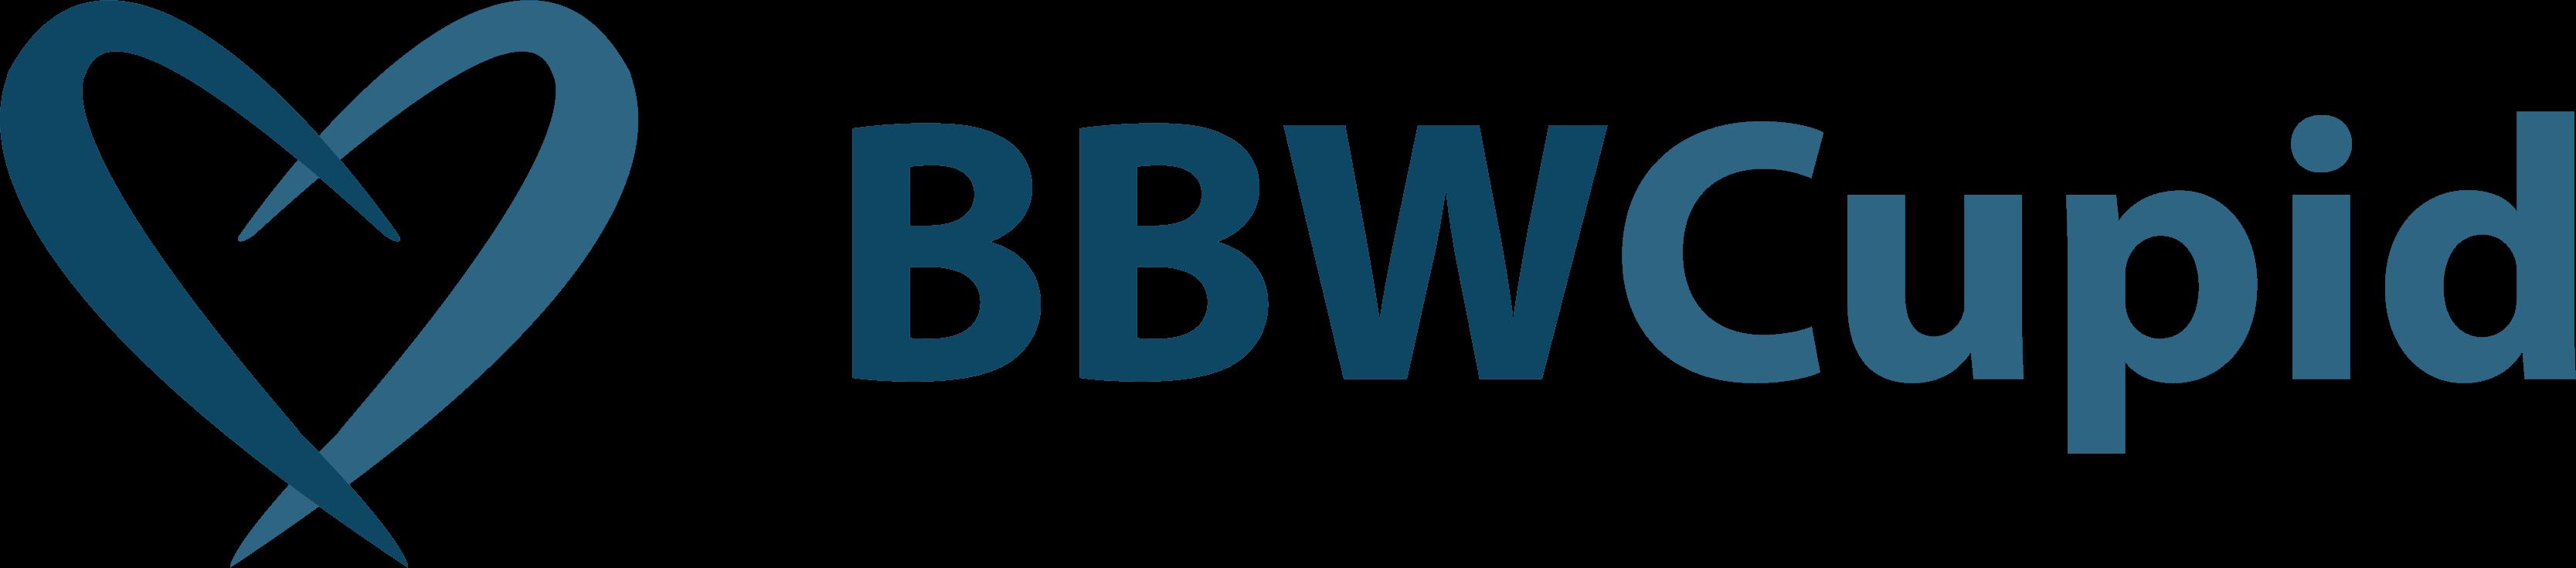 bbw dating free websites